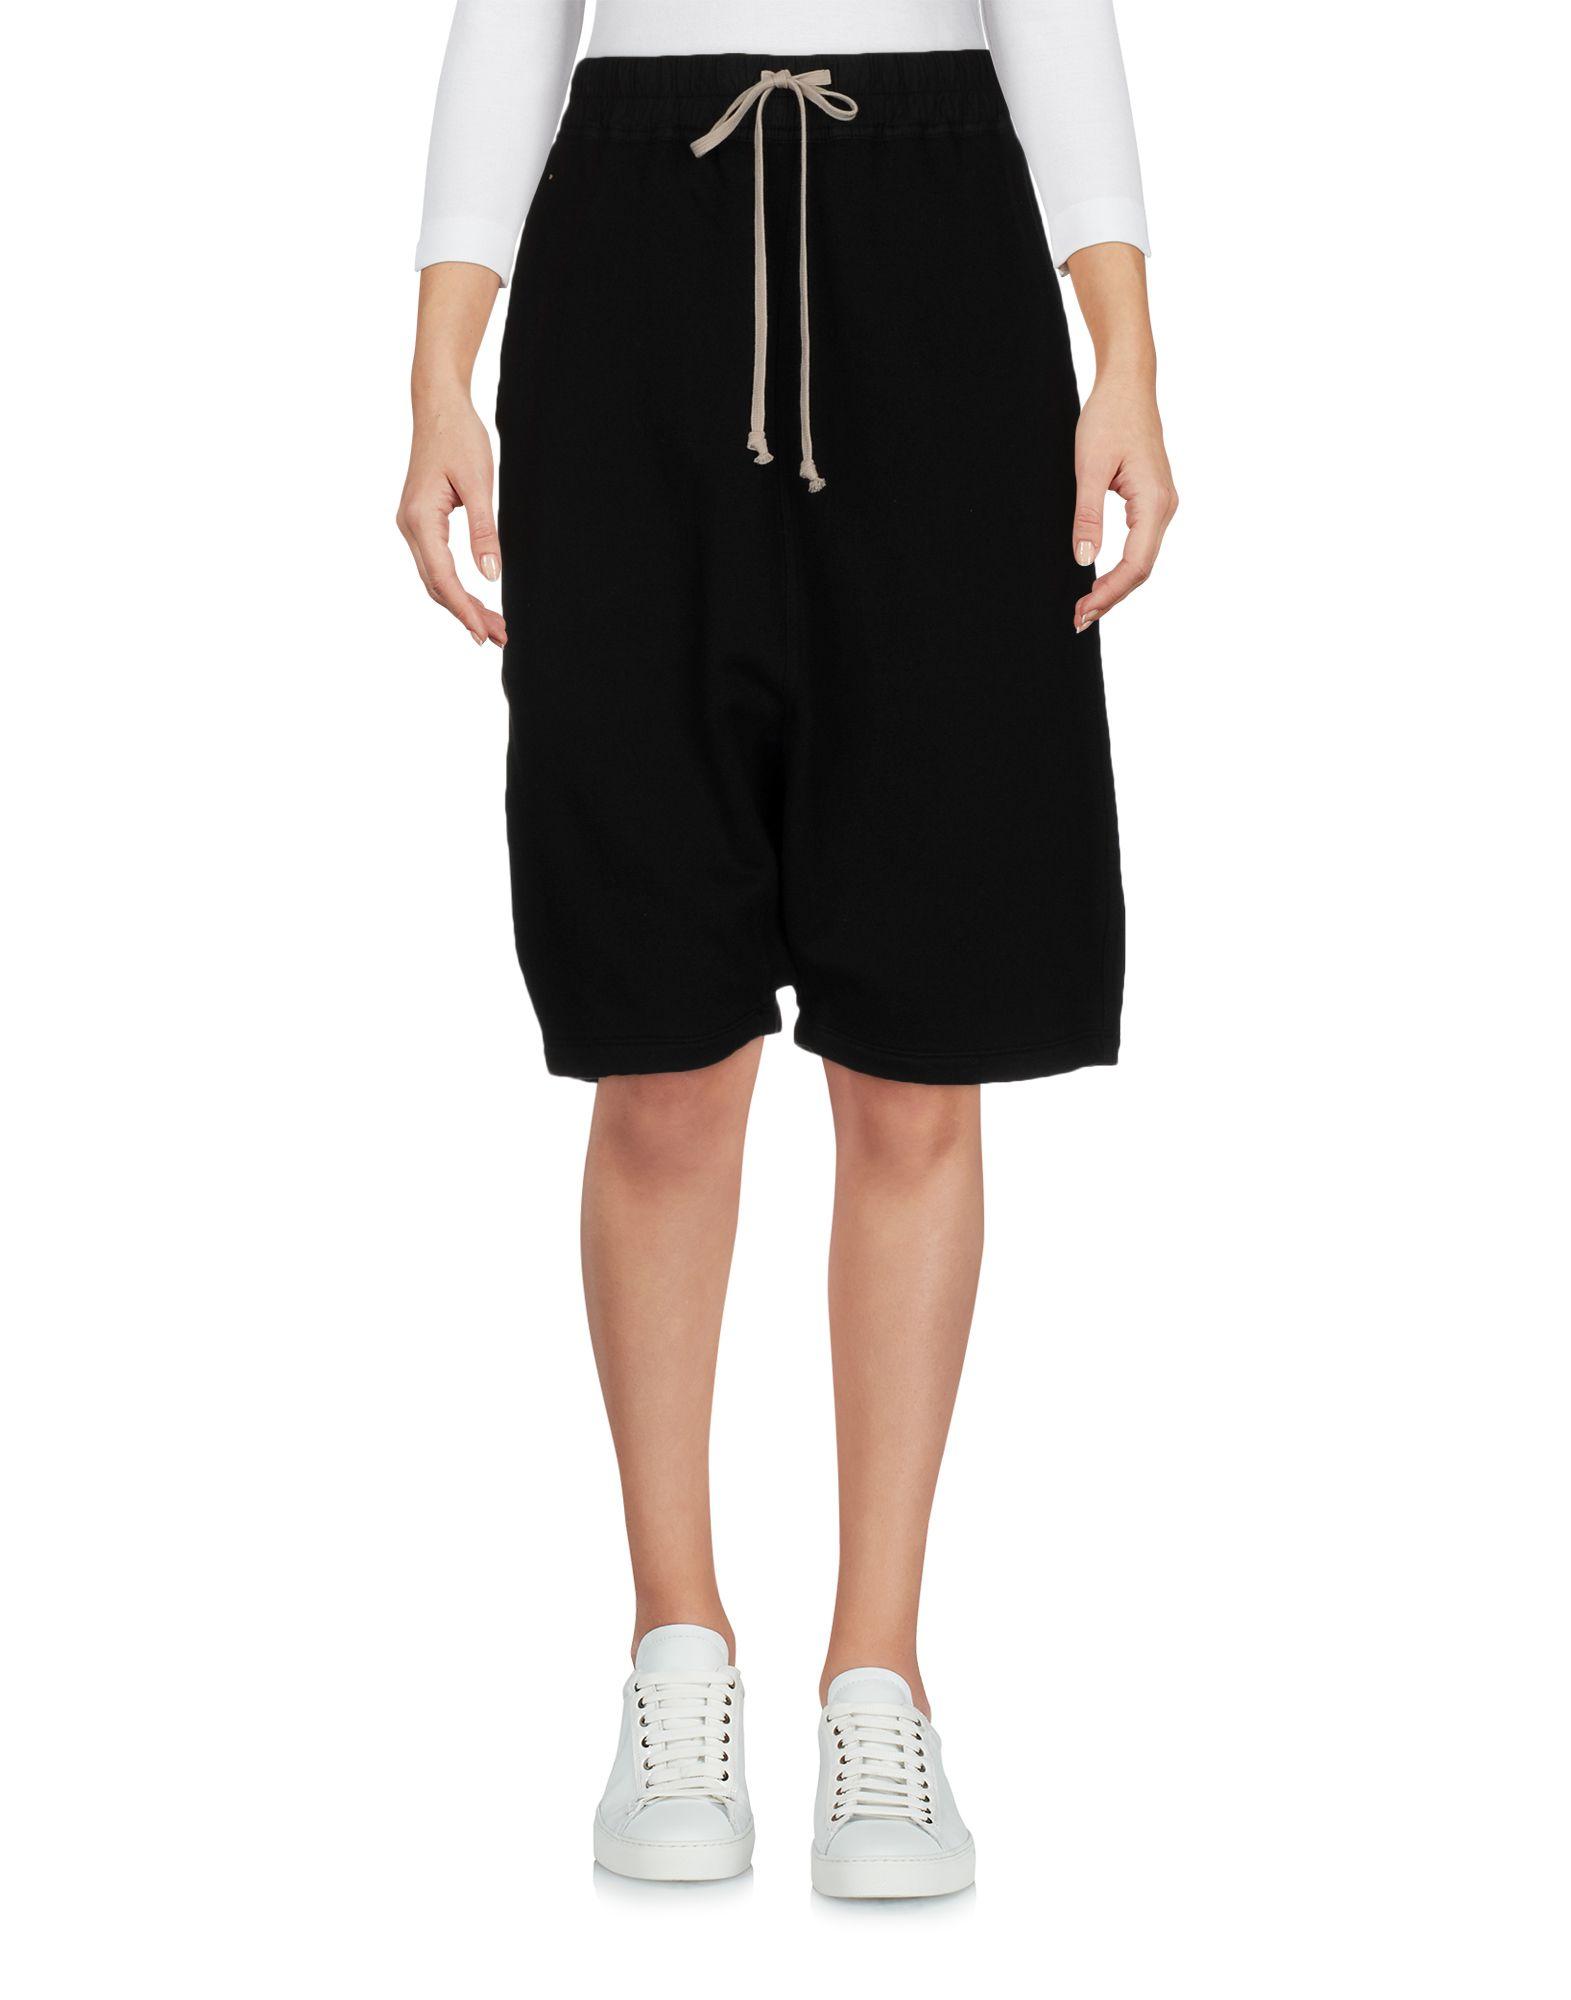 Pantalon - Bermuda Style Original Vintage UqKGIqIYfd